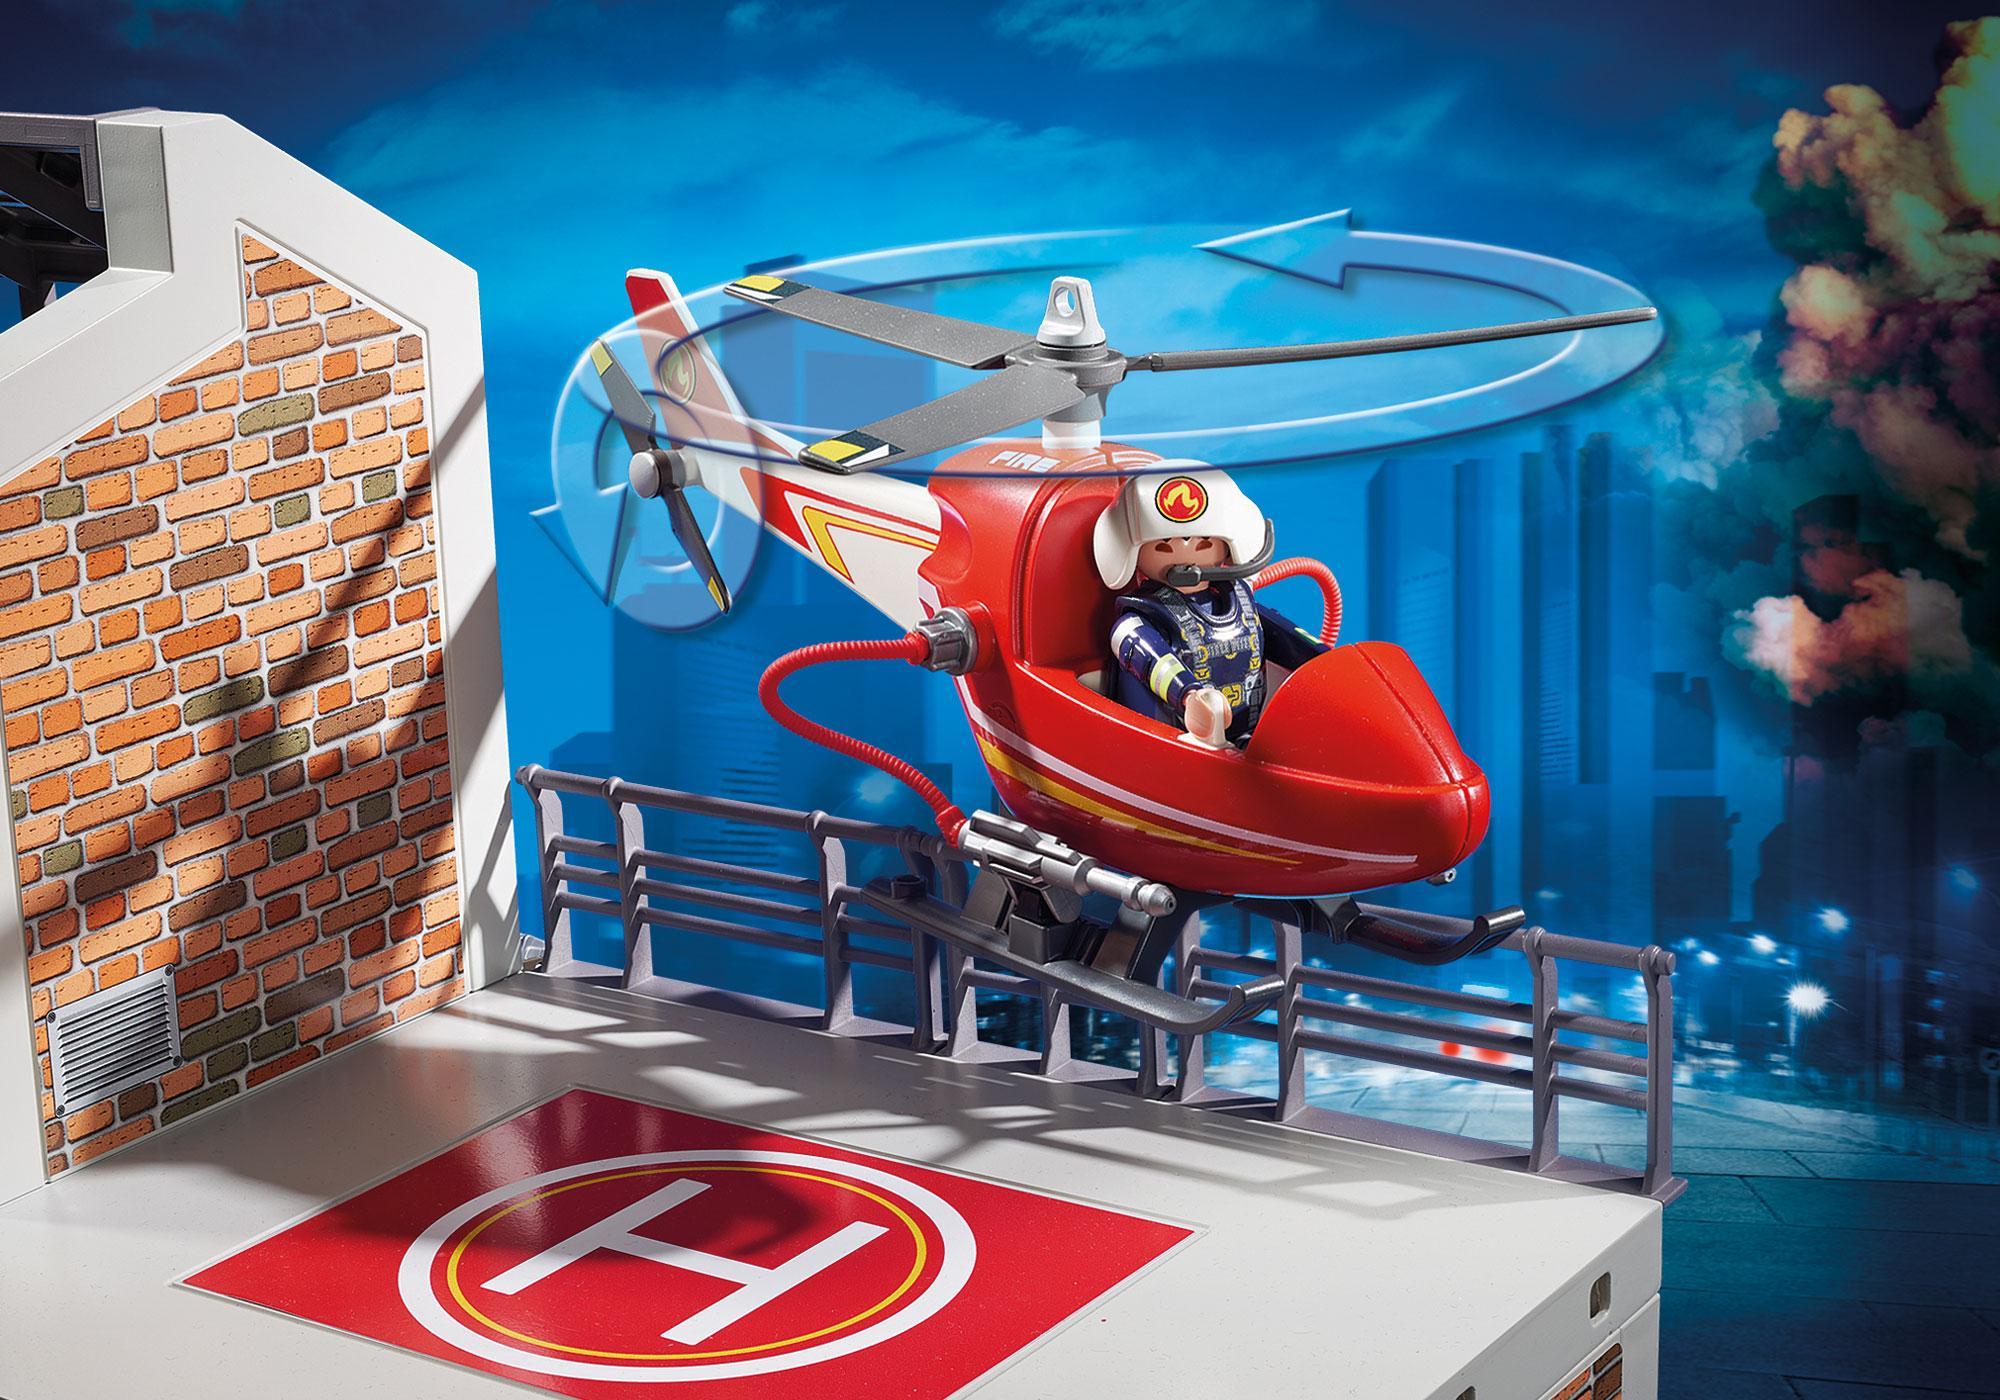 http://media.playmobil.com/i/playmobil/9462_product_extra1/Fire Station